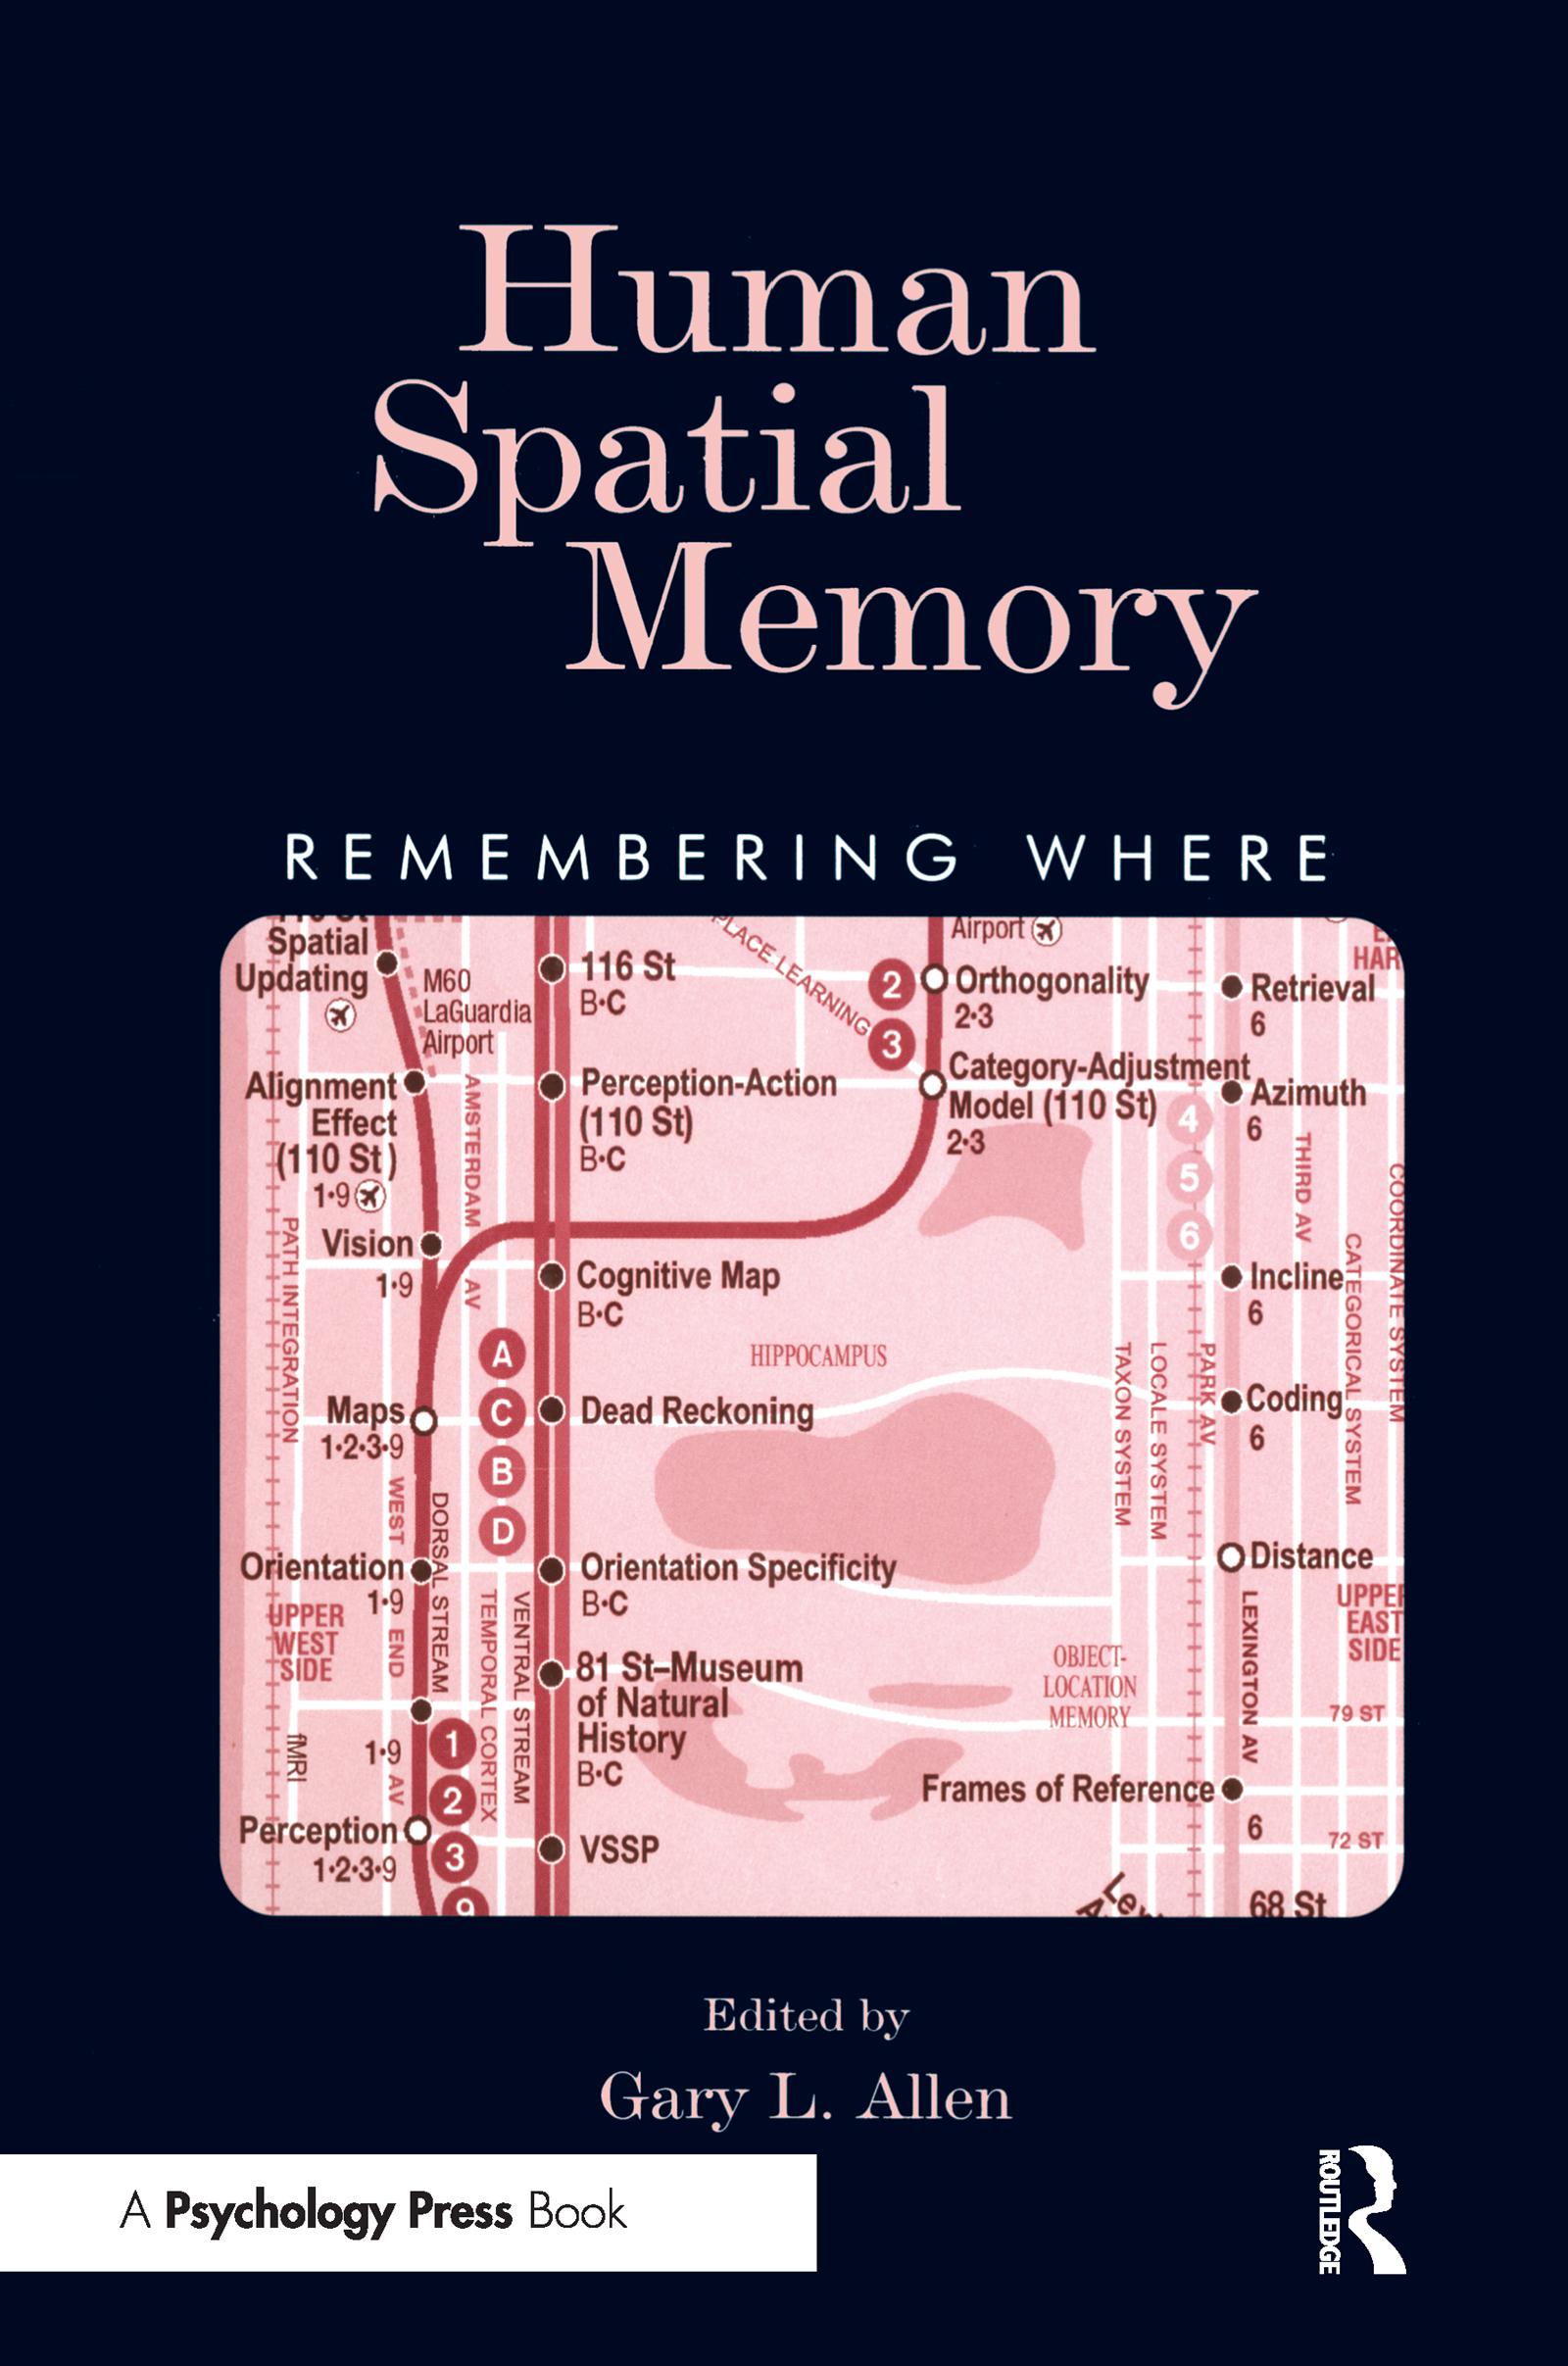 Human Spatial Memory: Remembering Where (Paperback) book cover